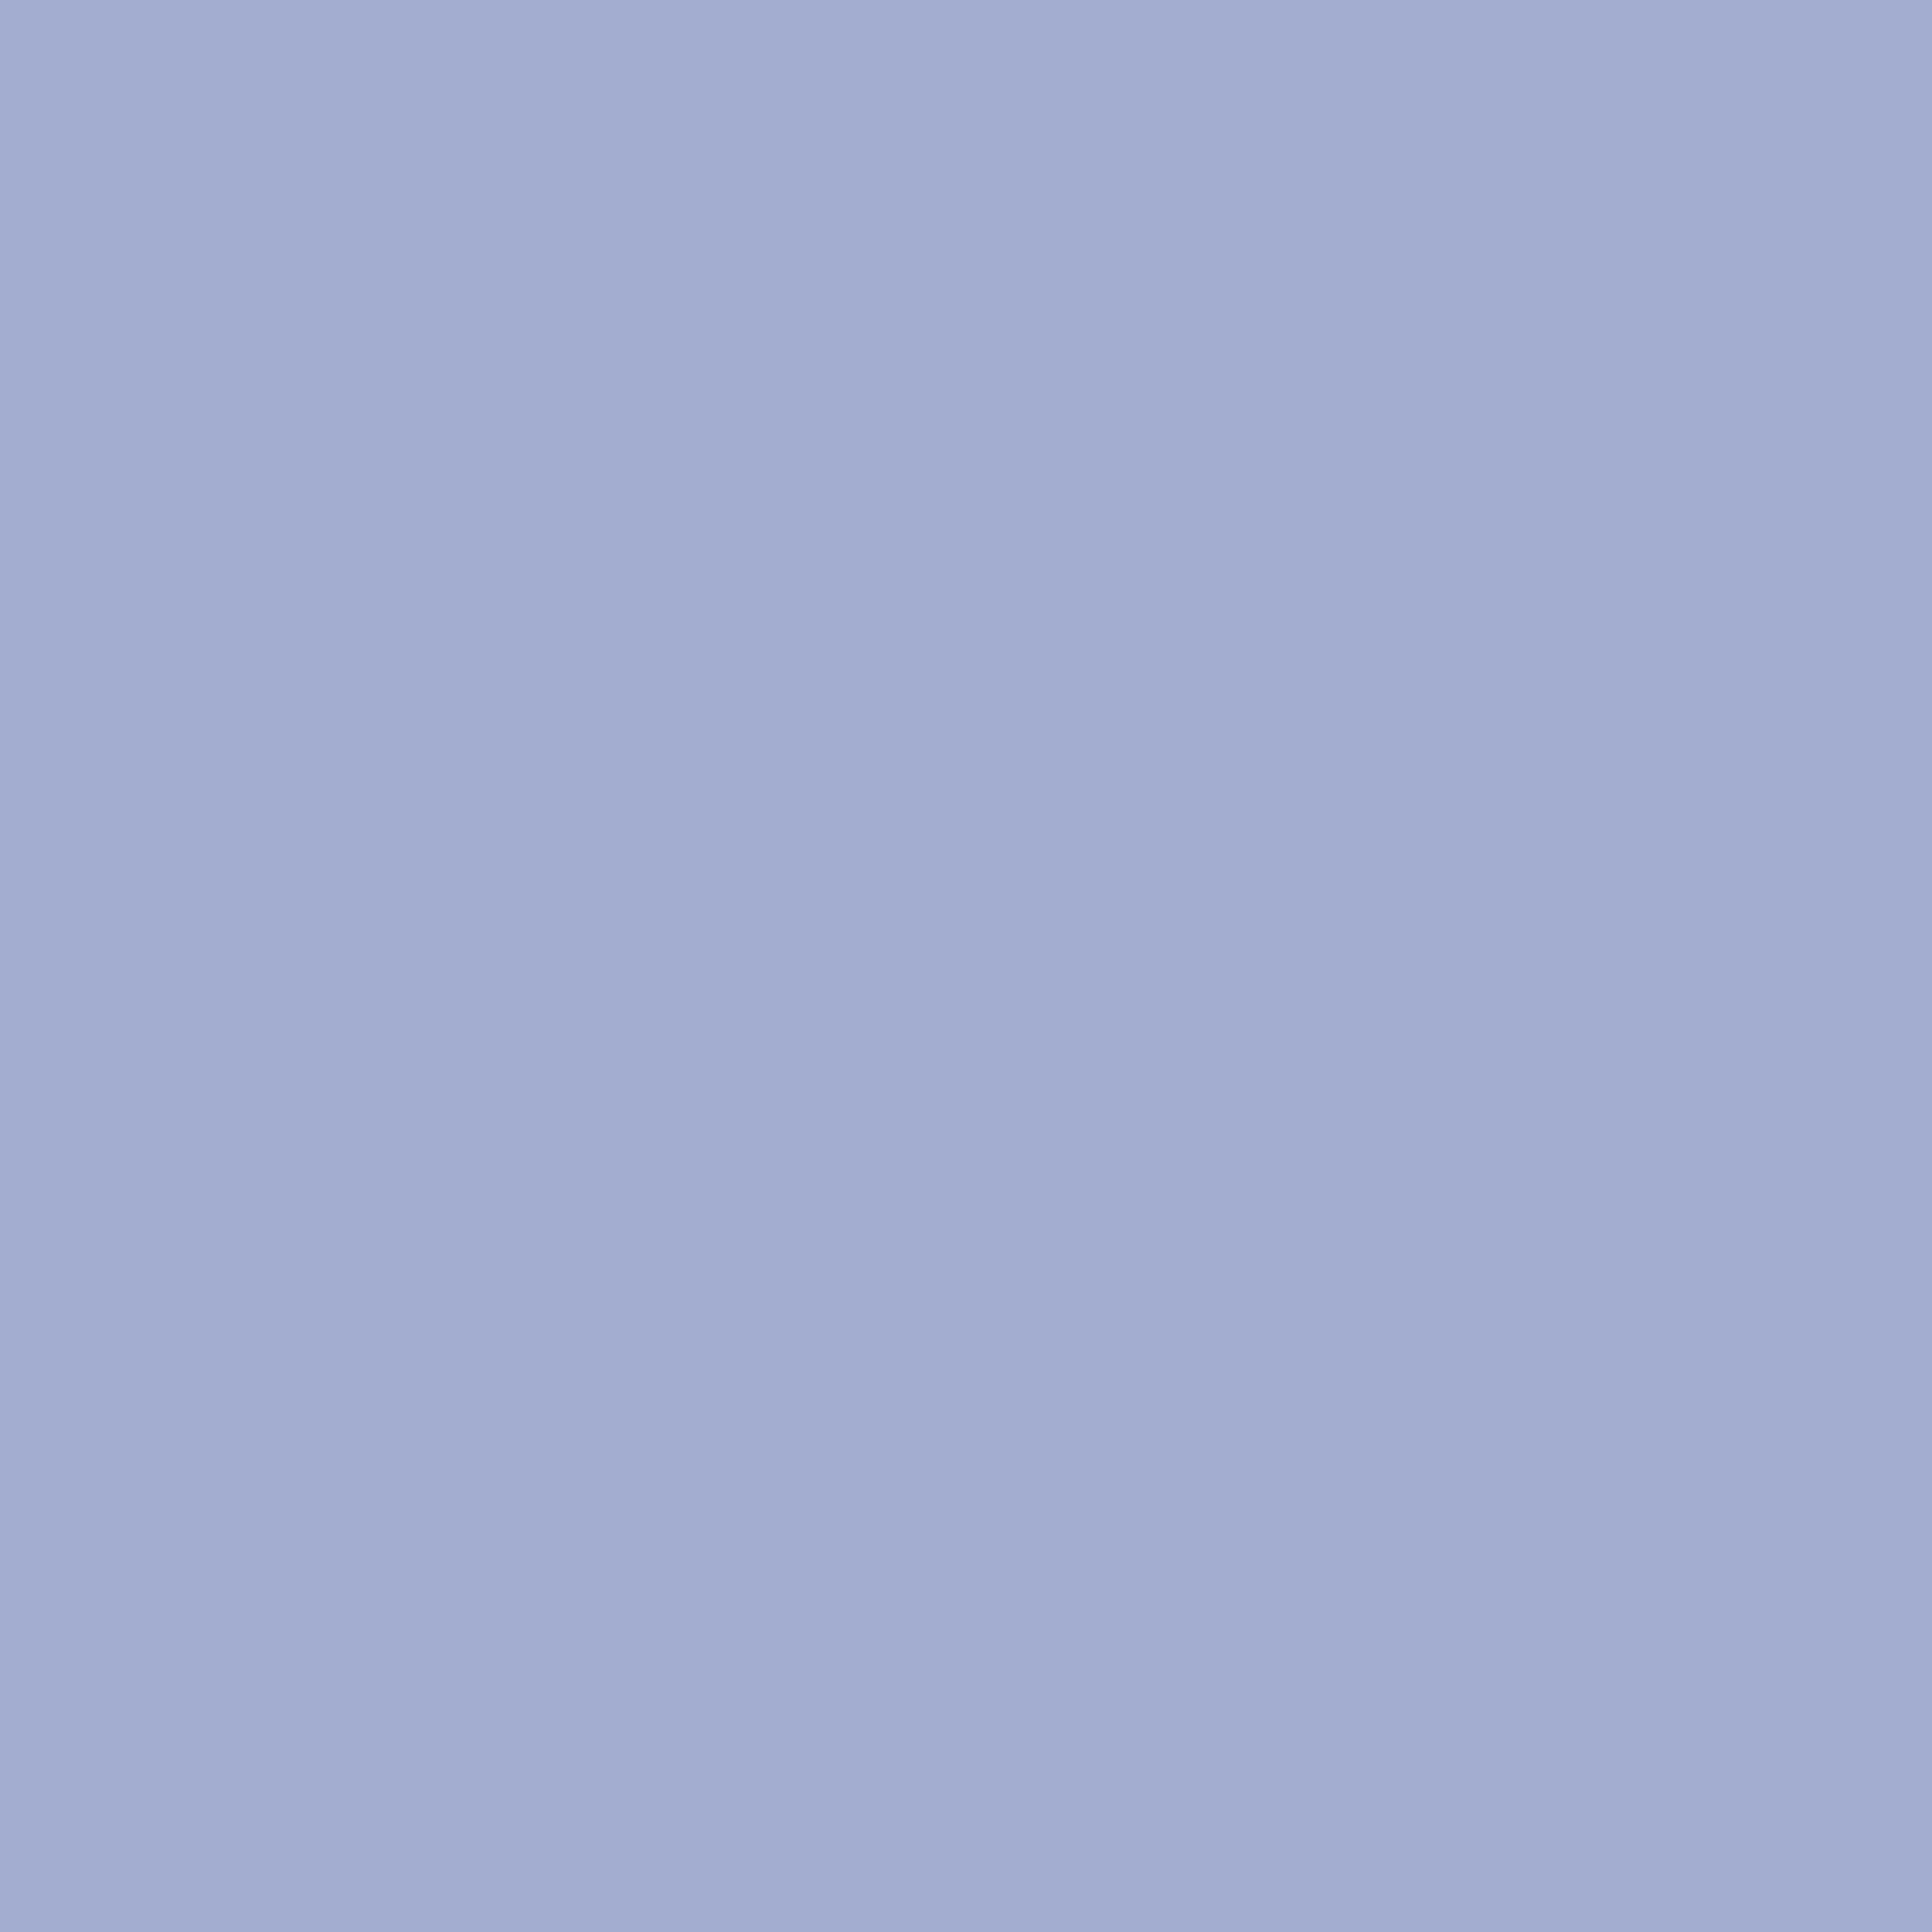 2732x2732 Wild Blue Yonder Solid Color Background